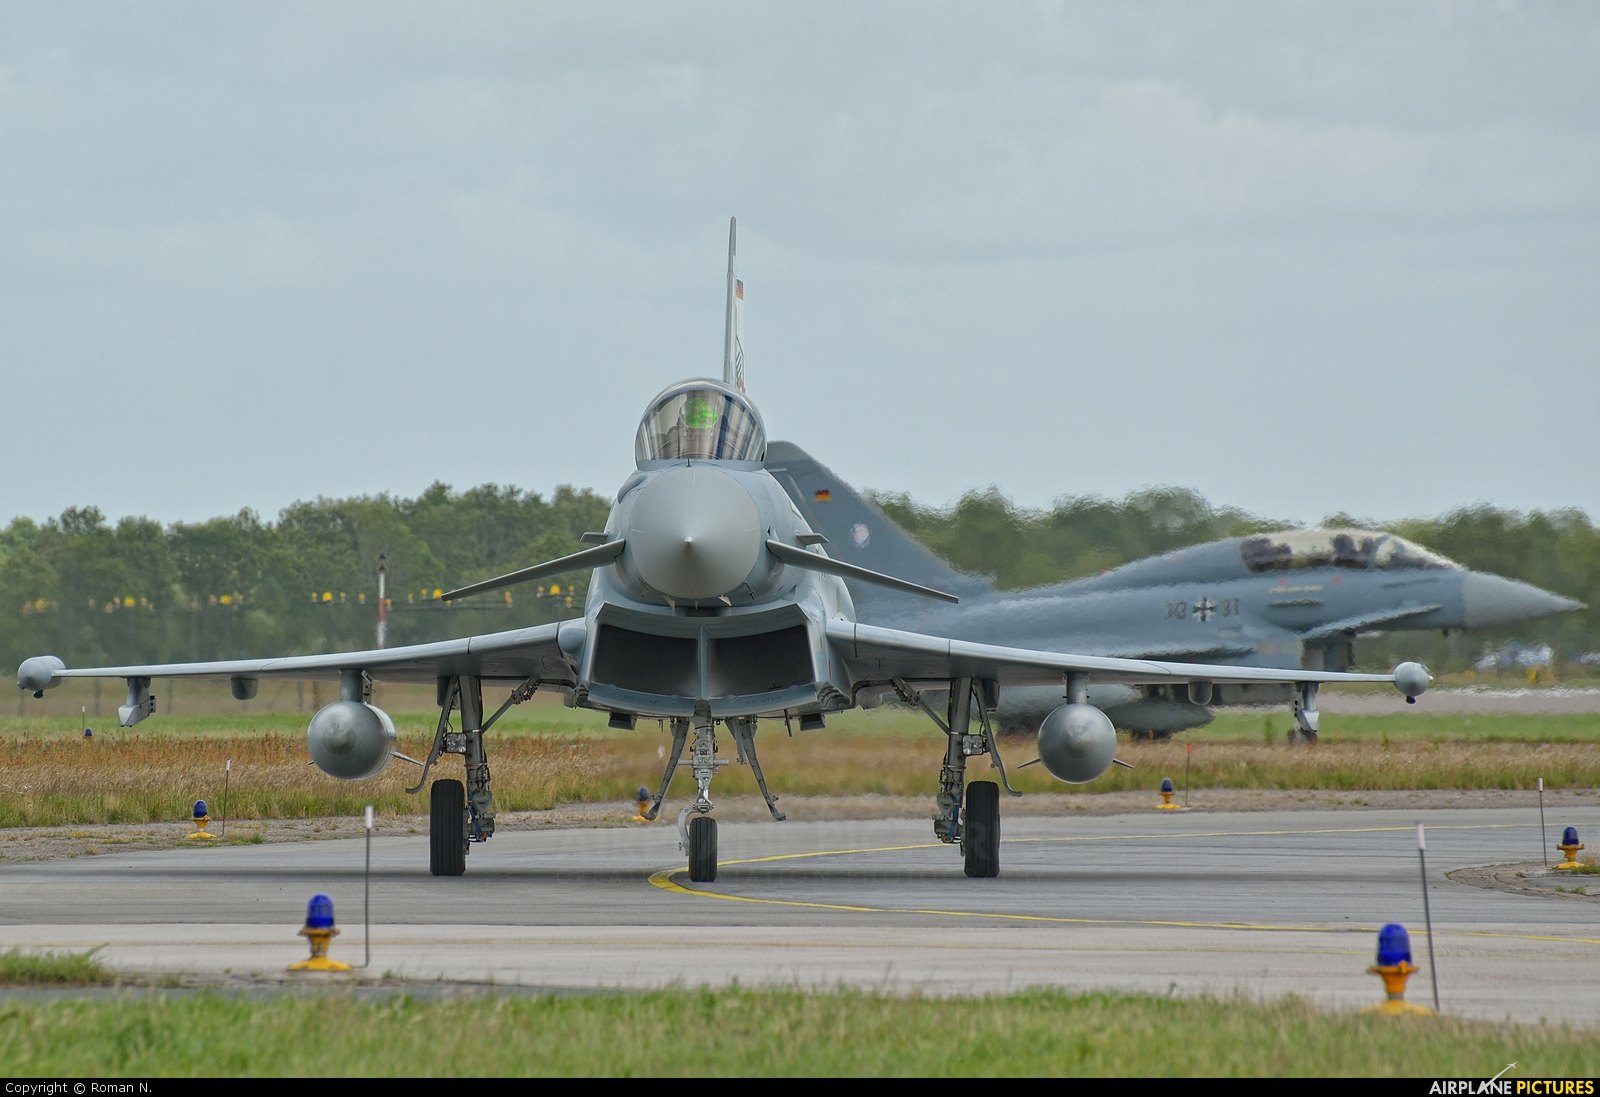 Germany - Air Force 31+00 aircraft at Wittmundhafen